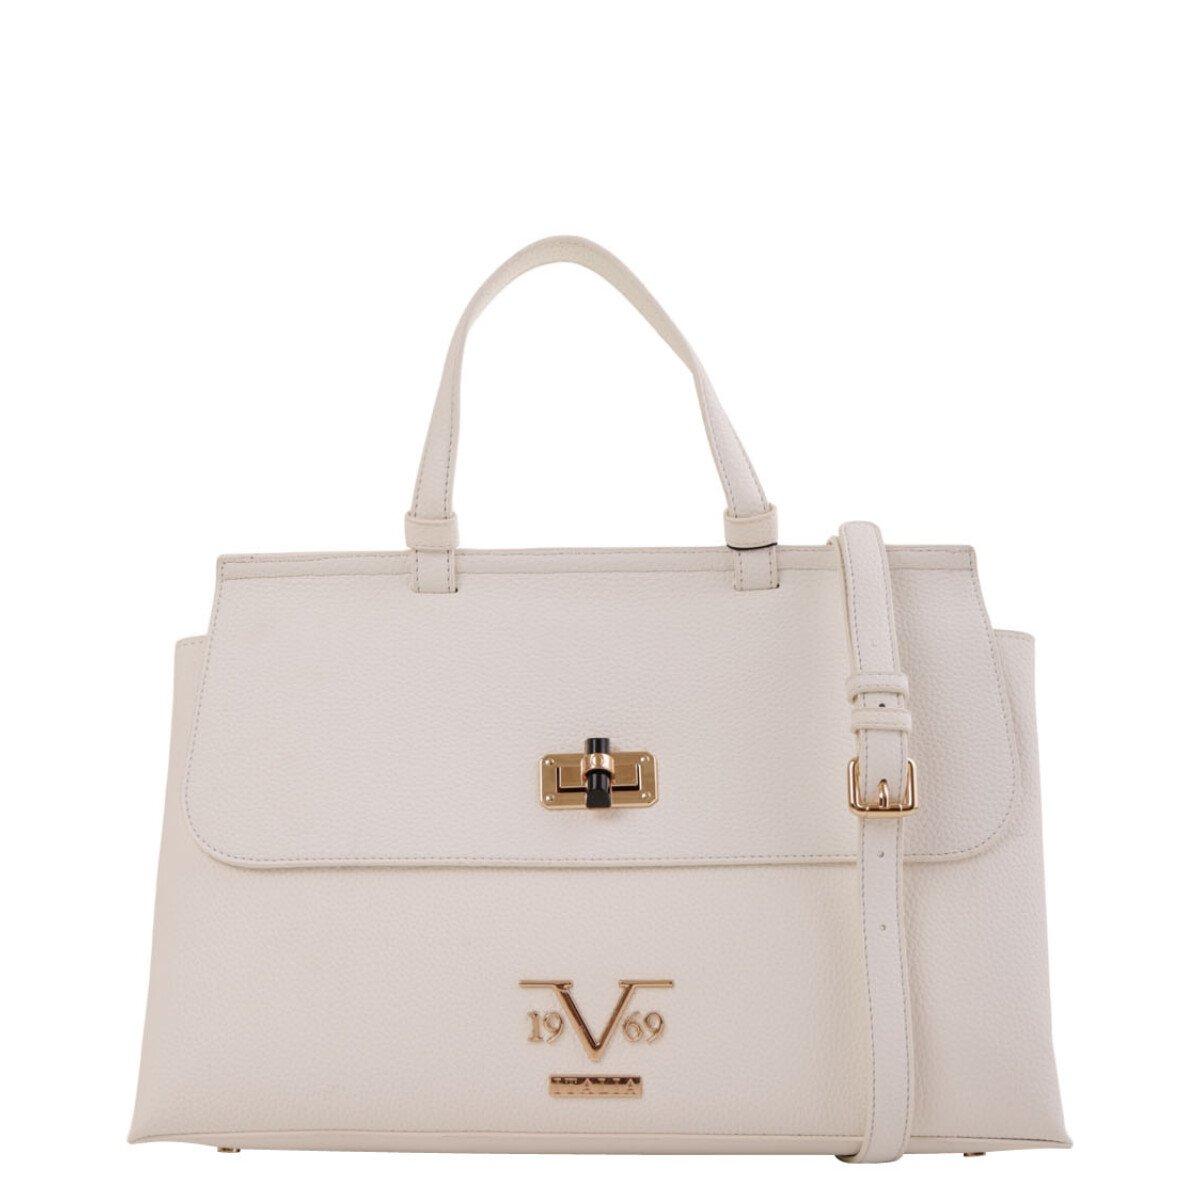 19v69 Italia Women's Handbag Various Colours 318989 - white UNICA